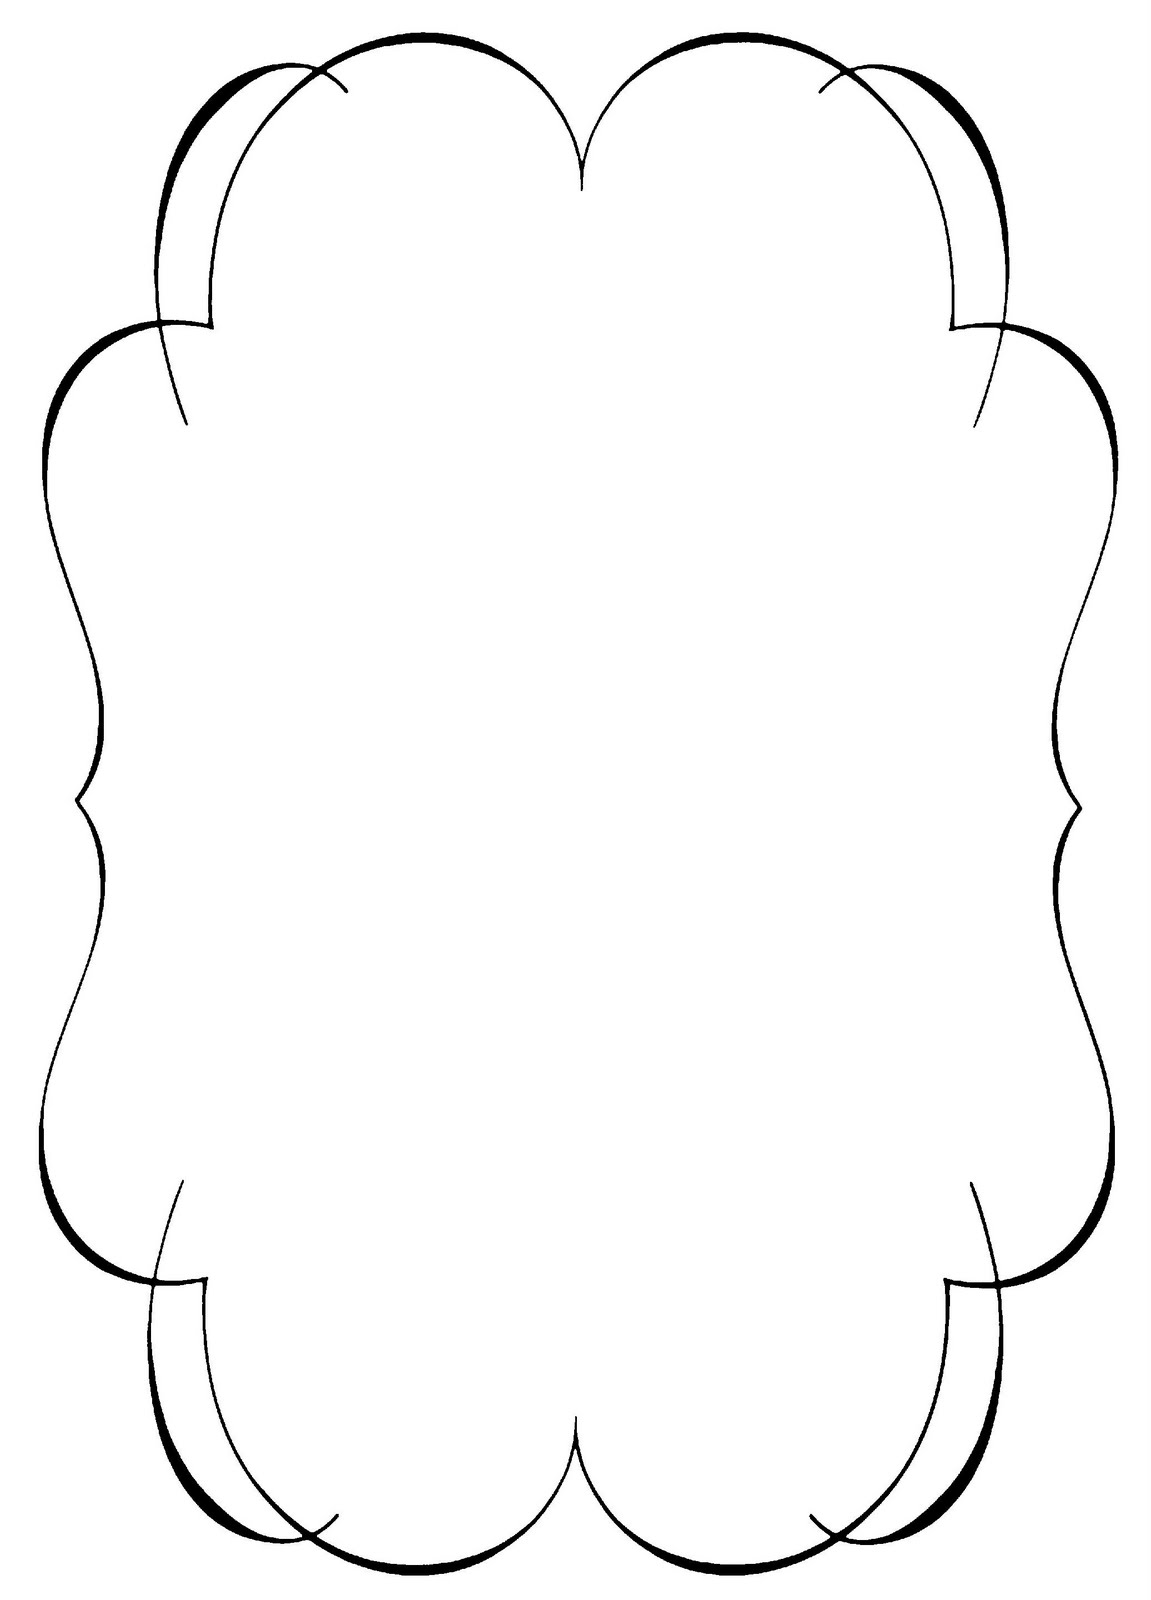 Simple Corner Borders Clip Ar - Free Clip Art Borders And Frames